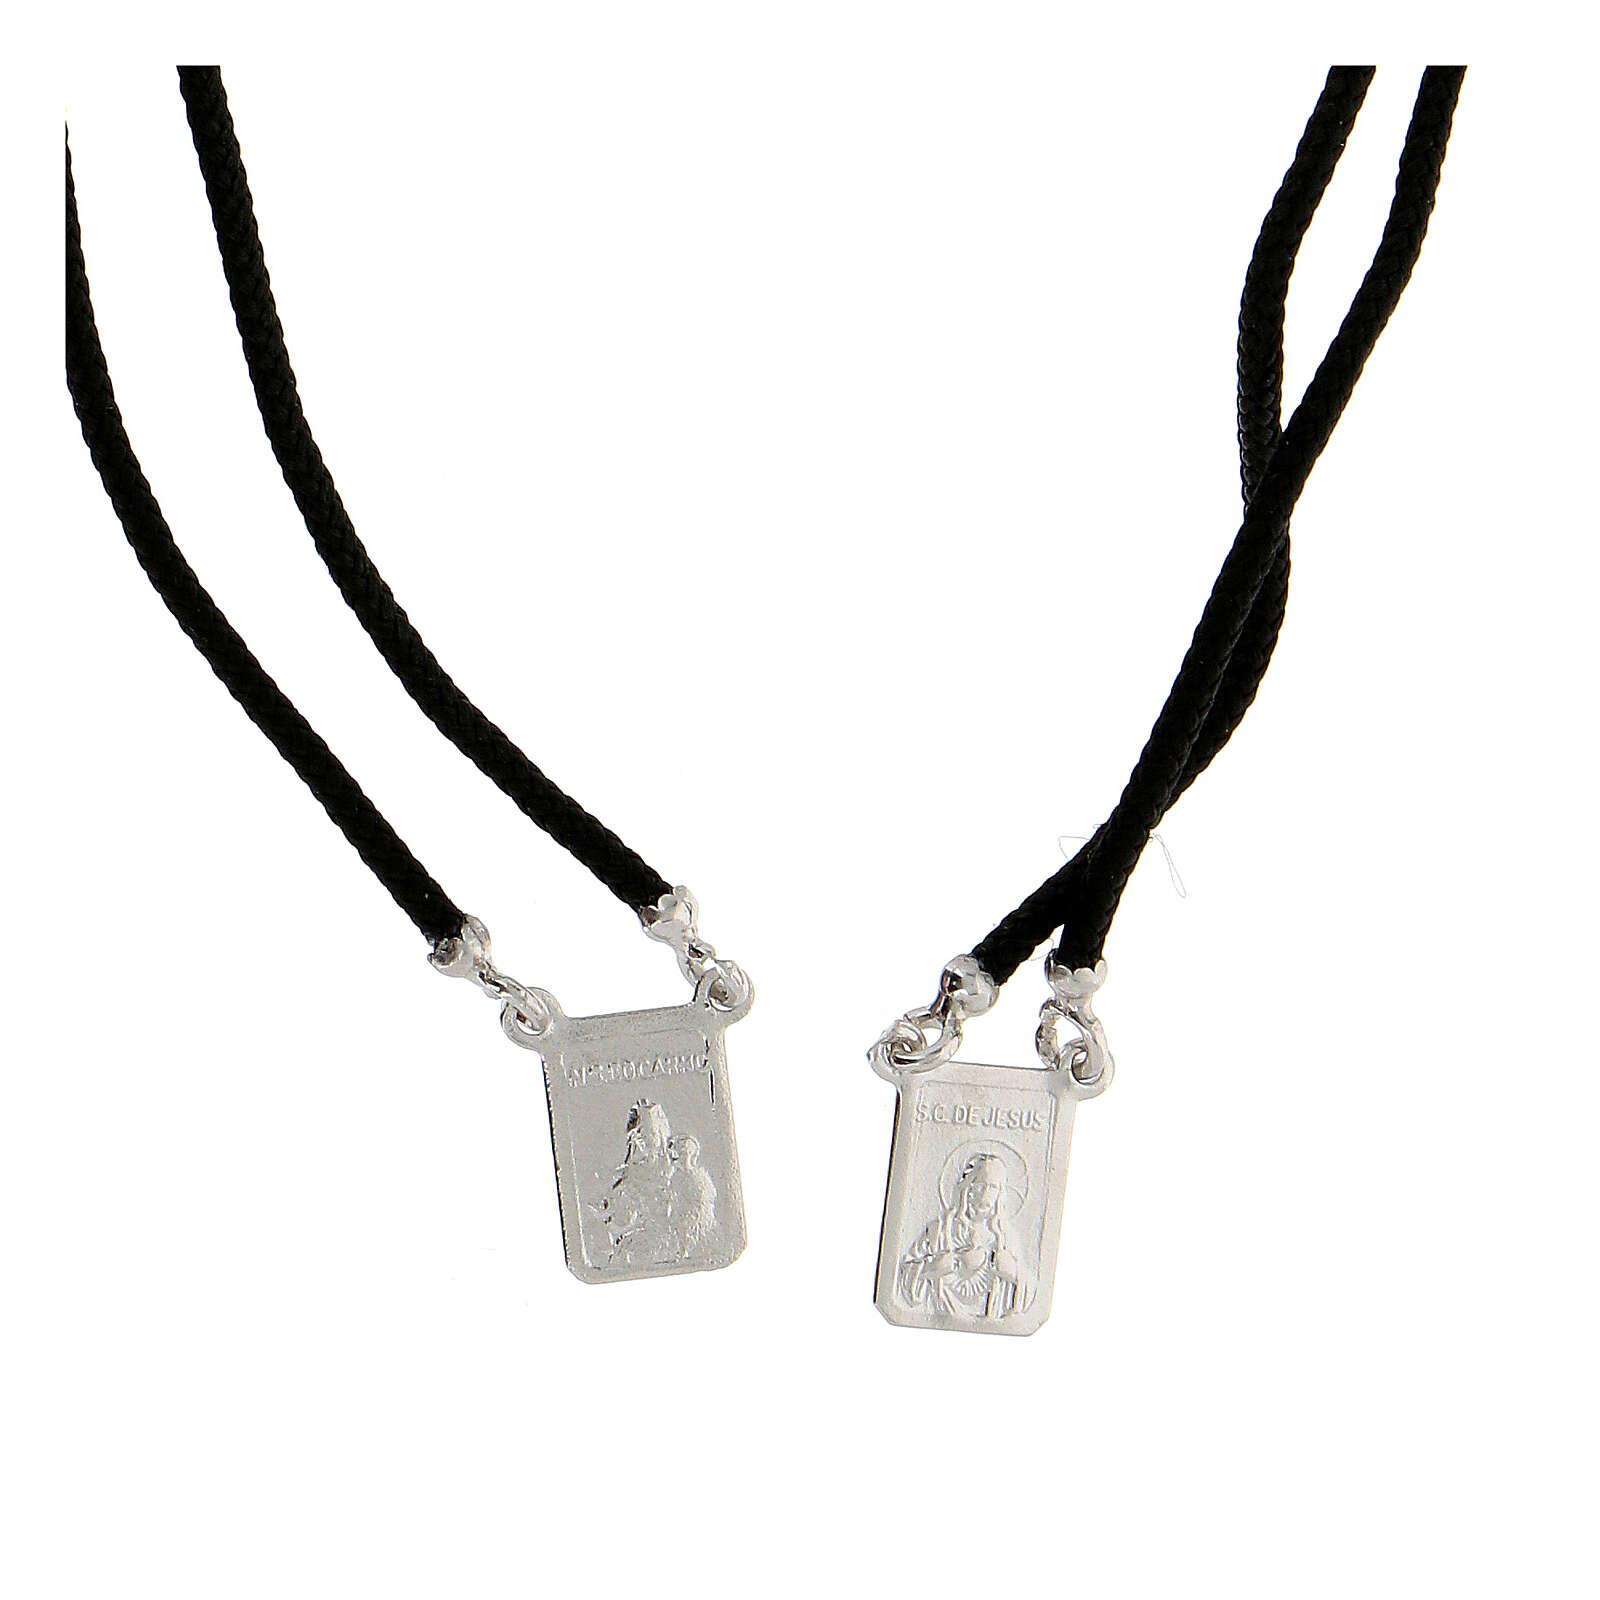 Scapolare nero sagola argento 925 medagliette rettangolari 4